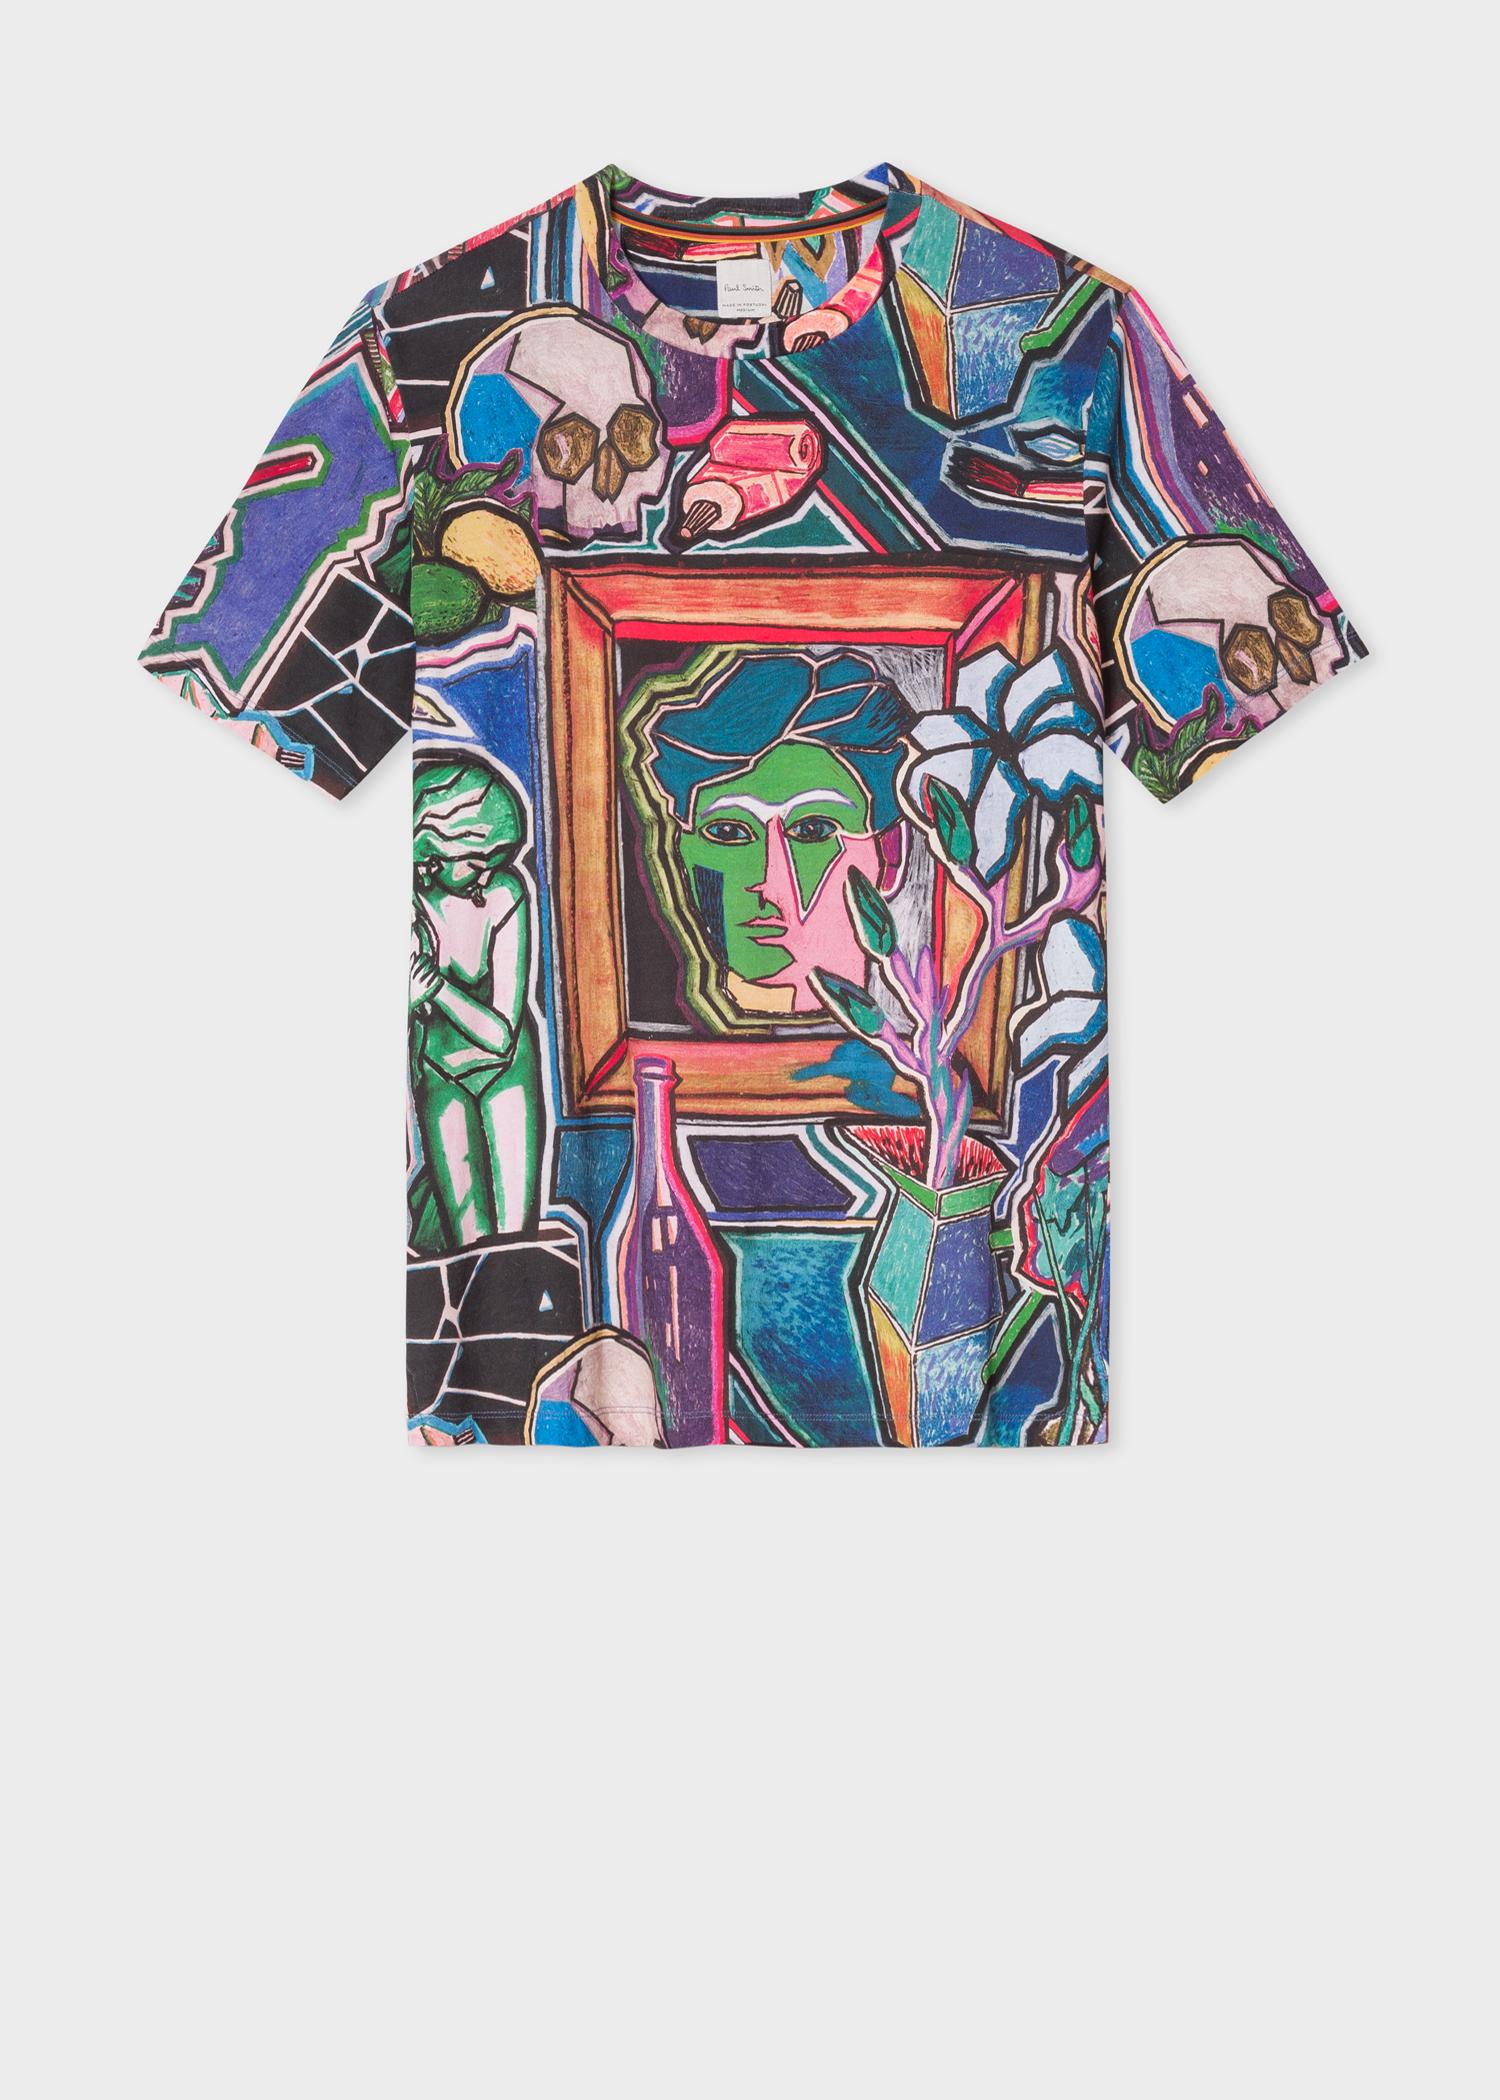 ed25f2cfd Front view - Men's 'Artist Studio' Print T-Shirt Paul Smith